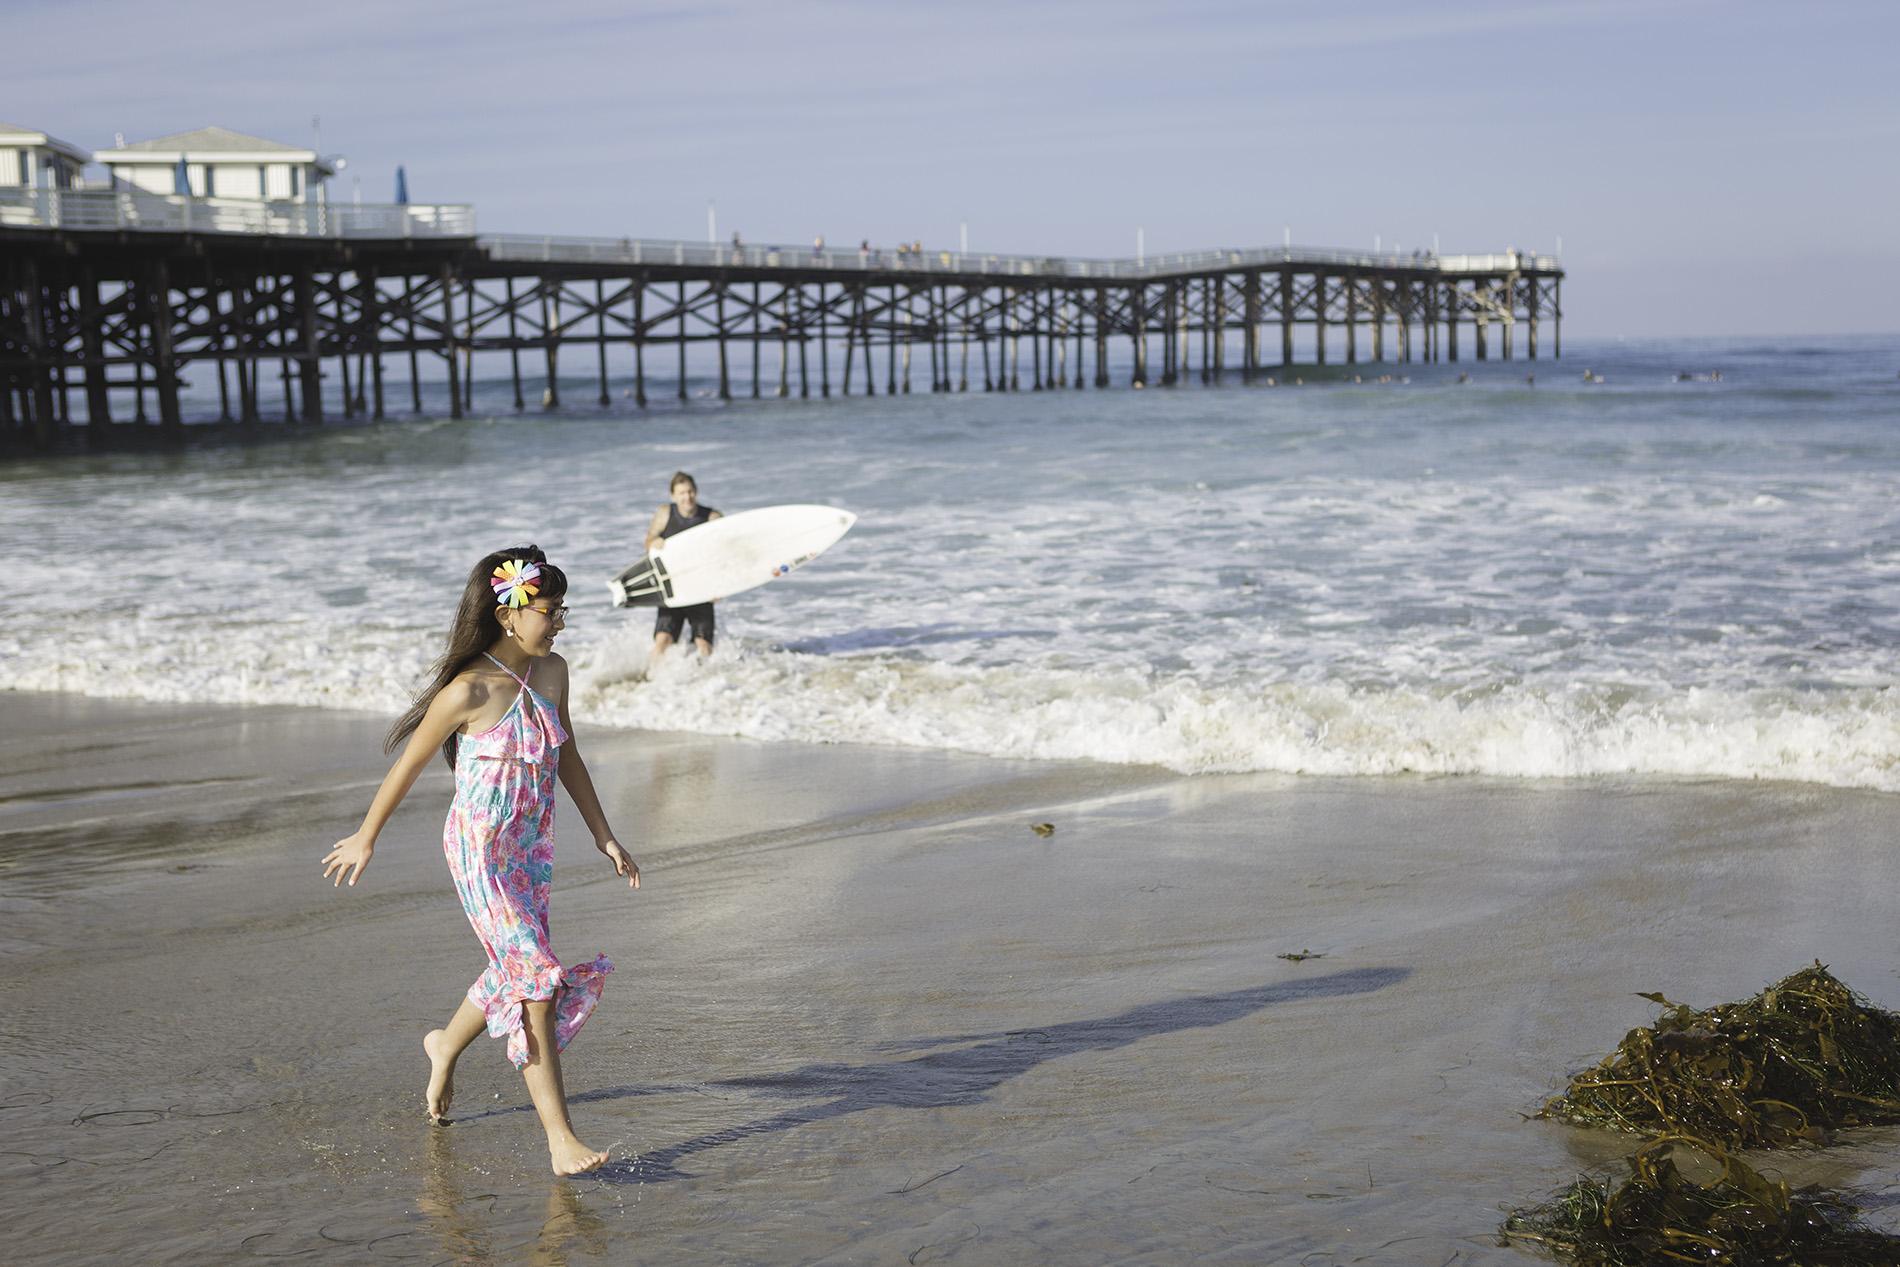 San.Diego.Vacation.Photographer.Christine.Dammann.Photographer.Beach.WS.GF1.jpg